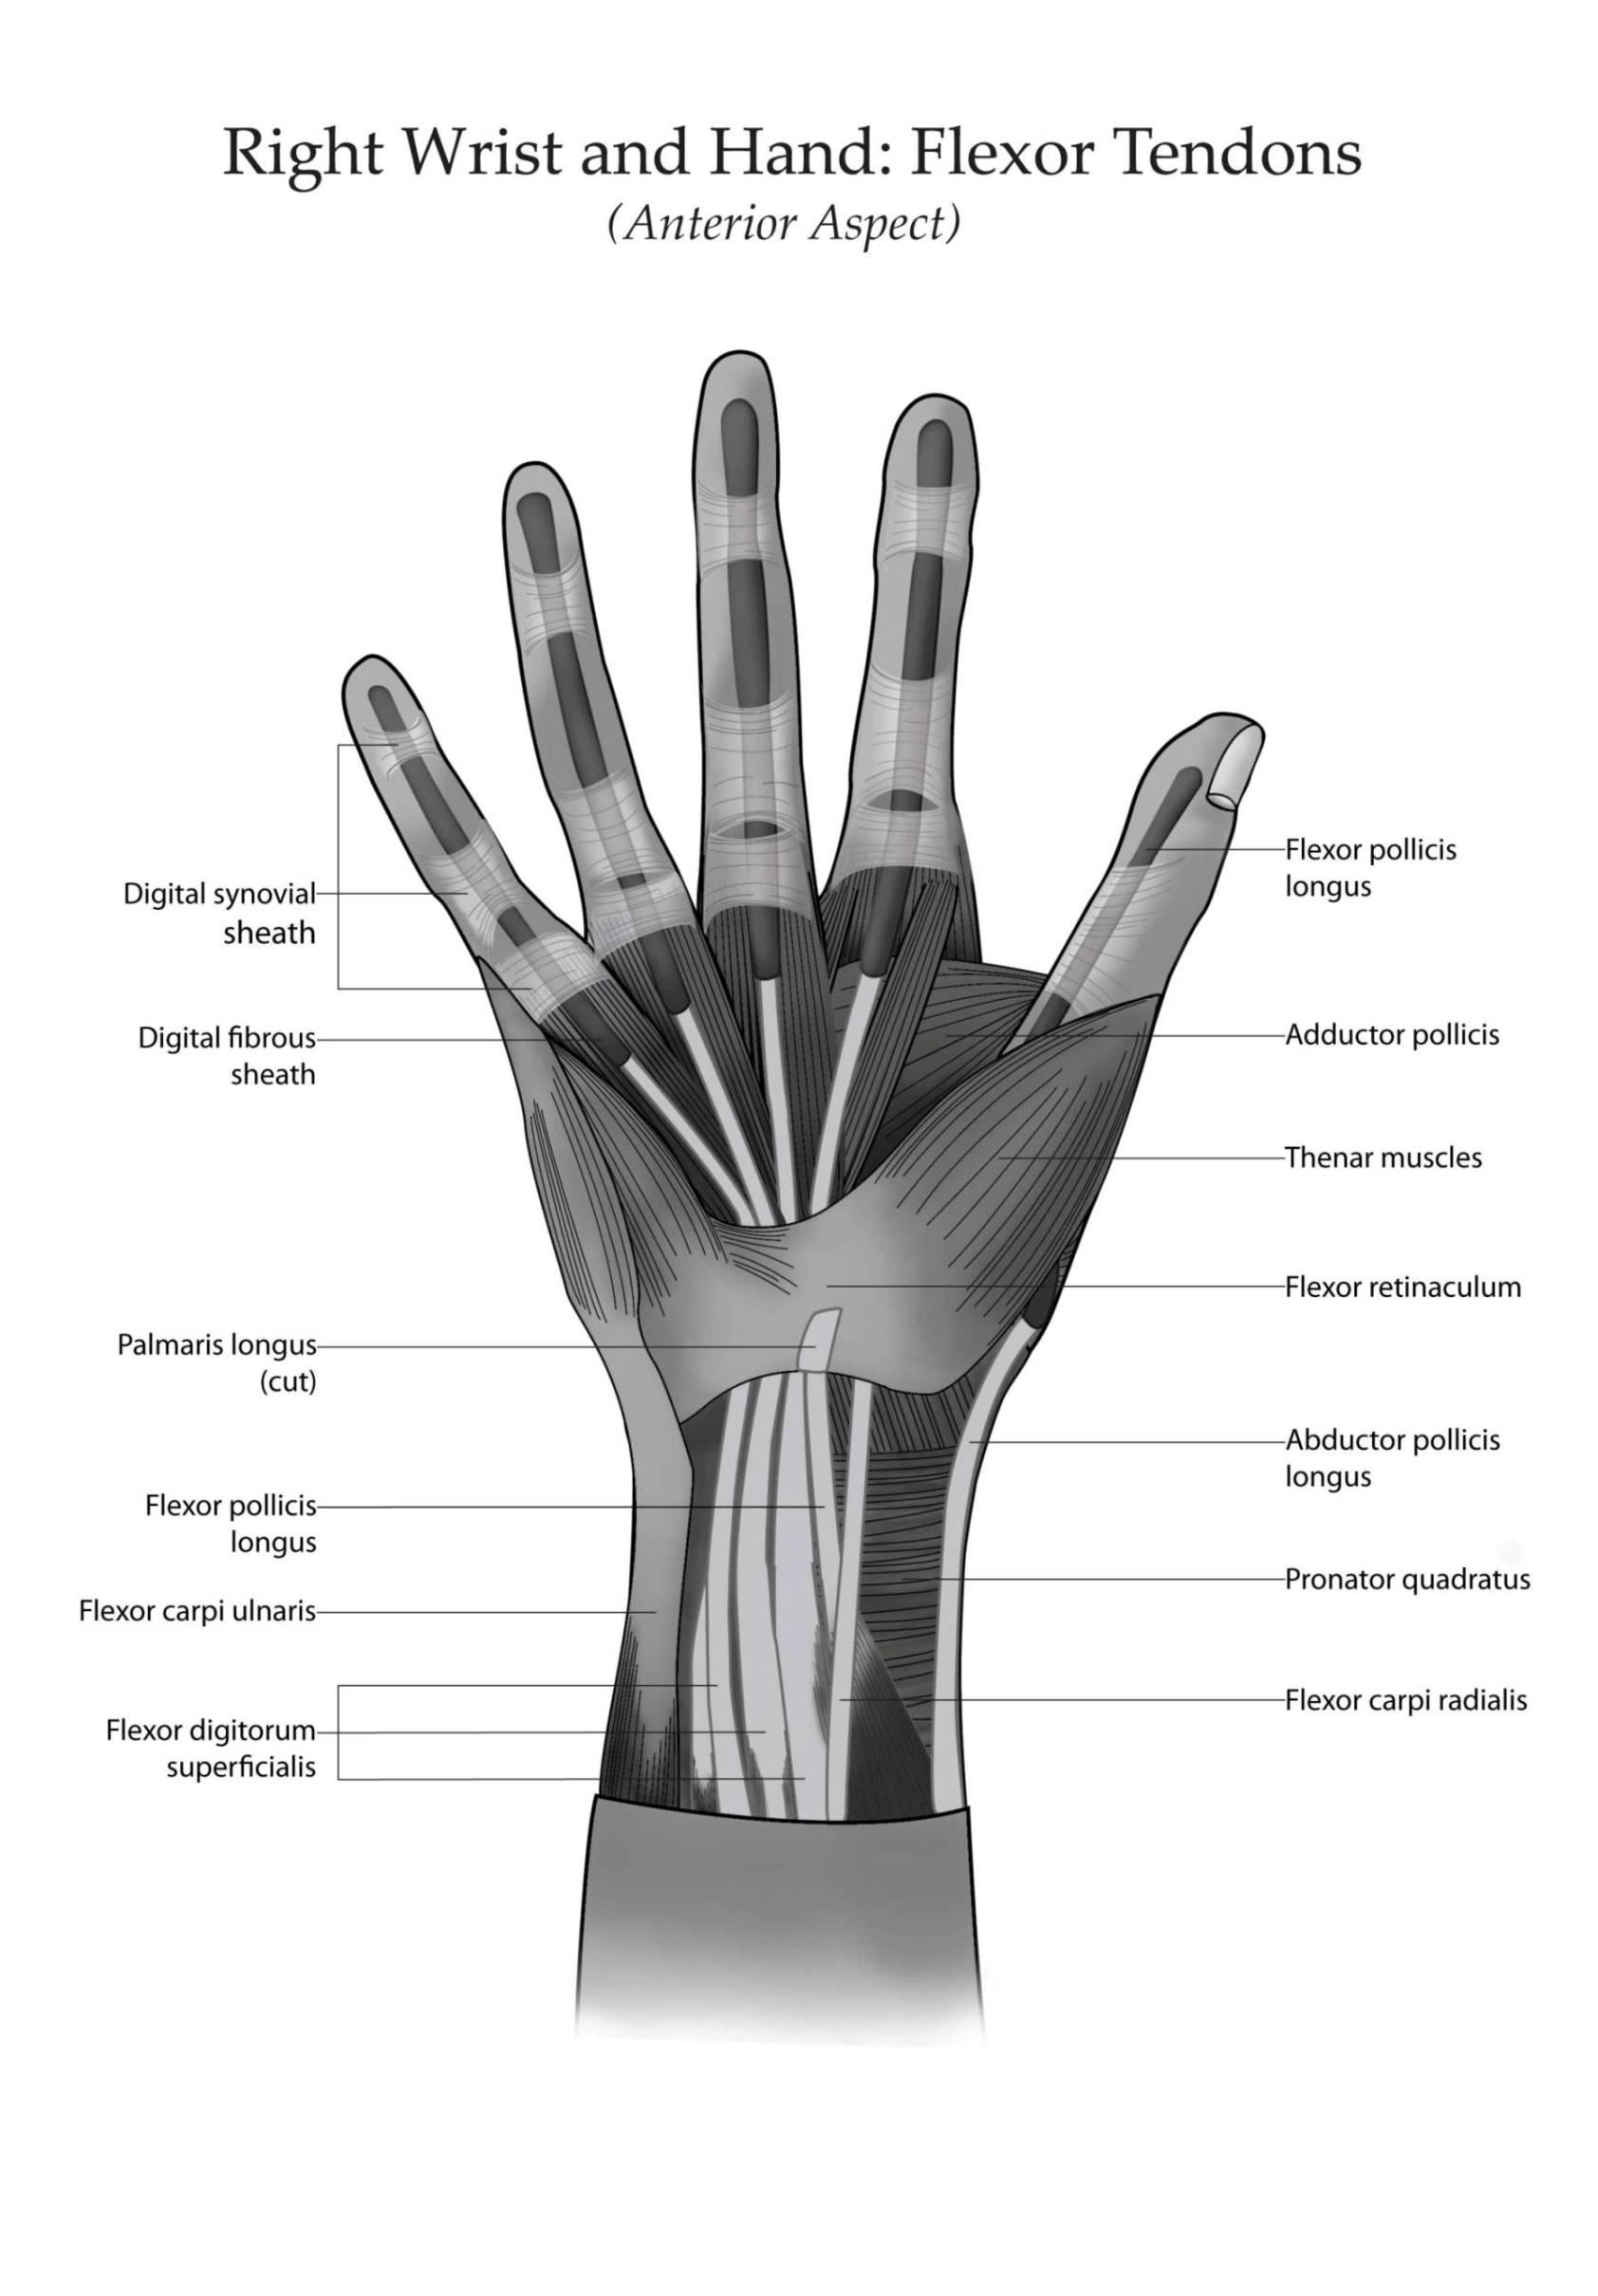 Are not thumb flexor tendons valuable phrase